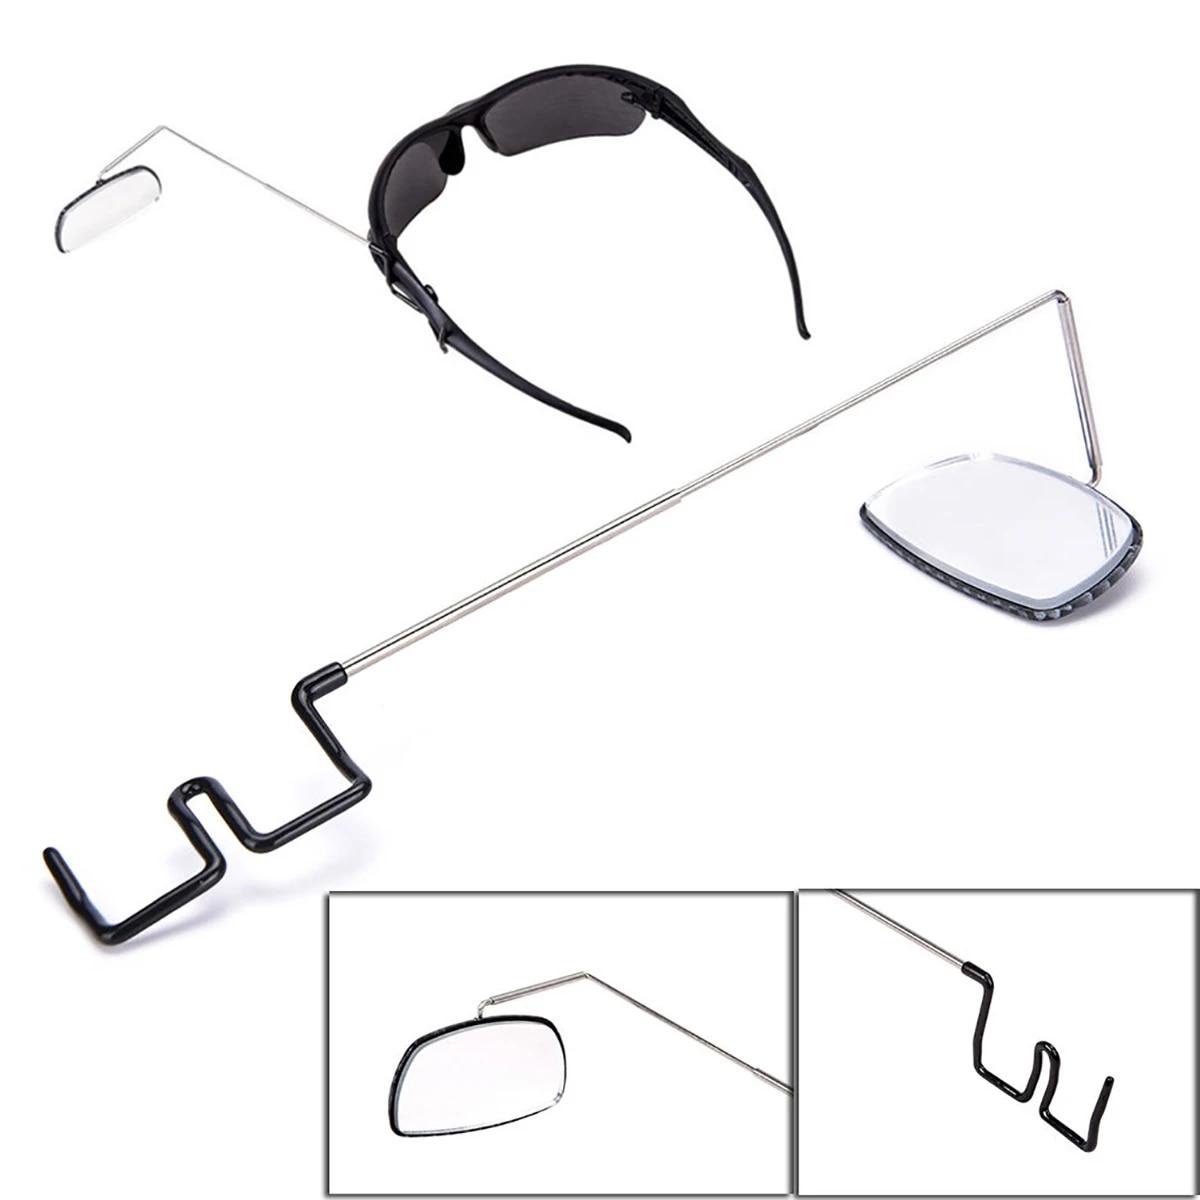 Adjustable Bike Helmet Rearview Mirror Bicycle Cycling Riding Rear View Eyeglass